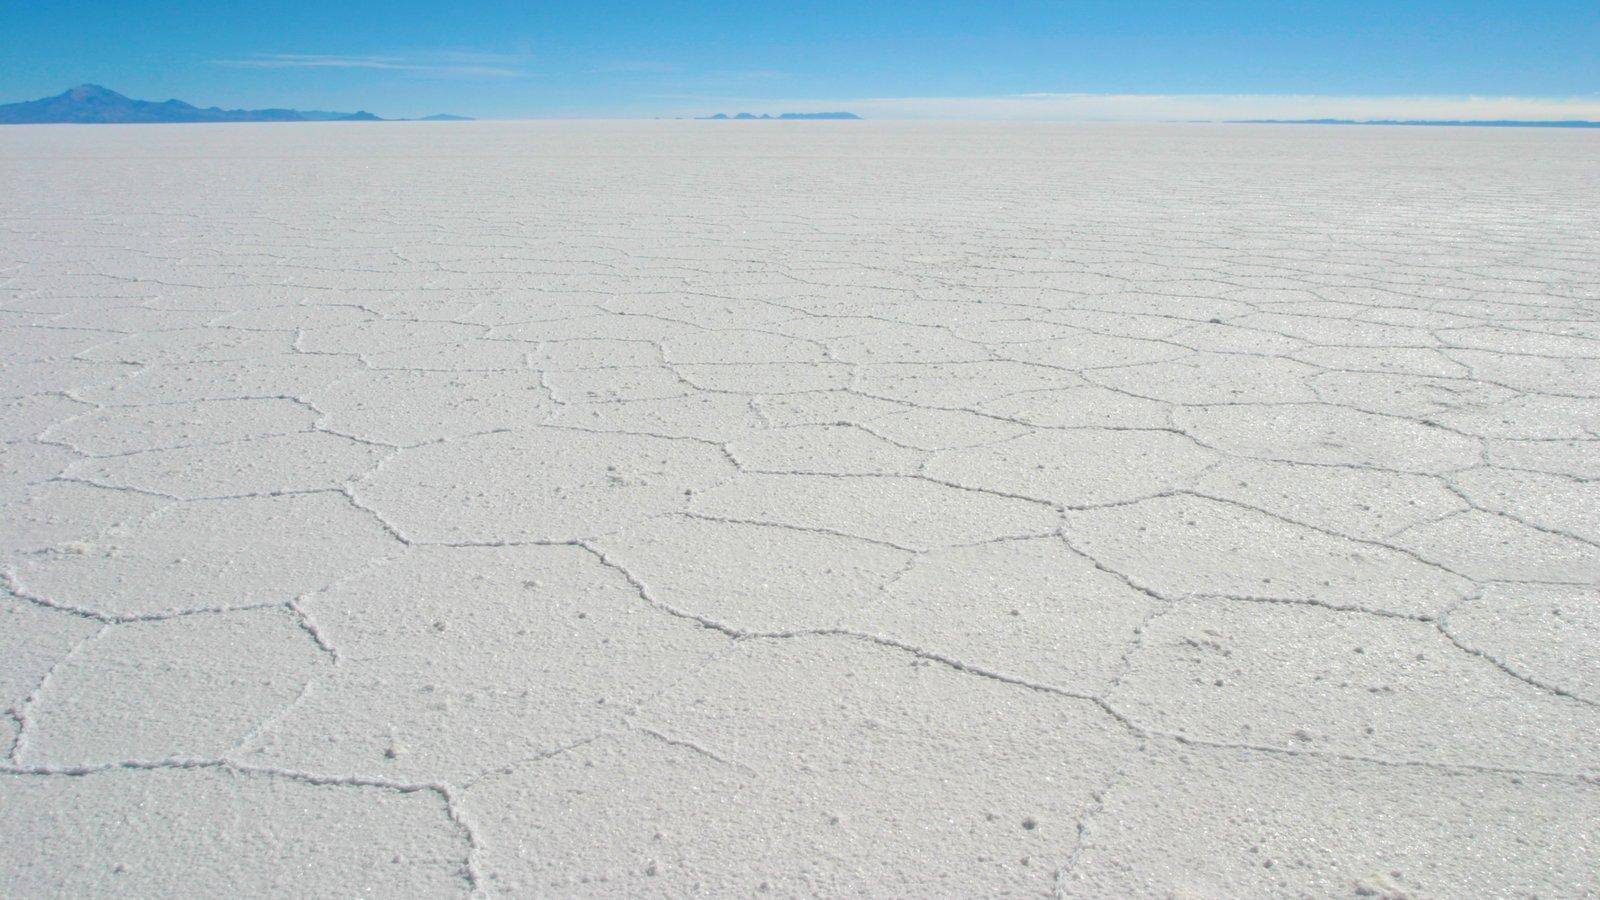 Salar de Uyuni showing landscape views and a lake or waterhole